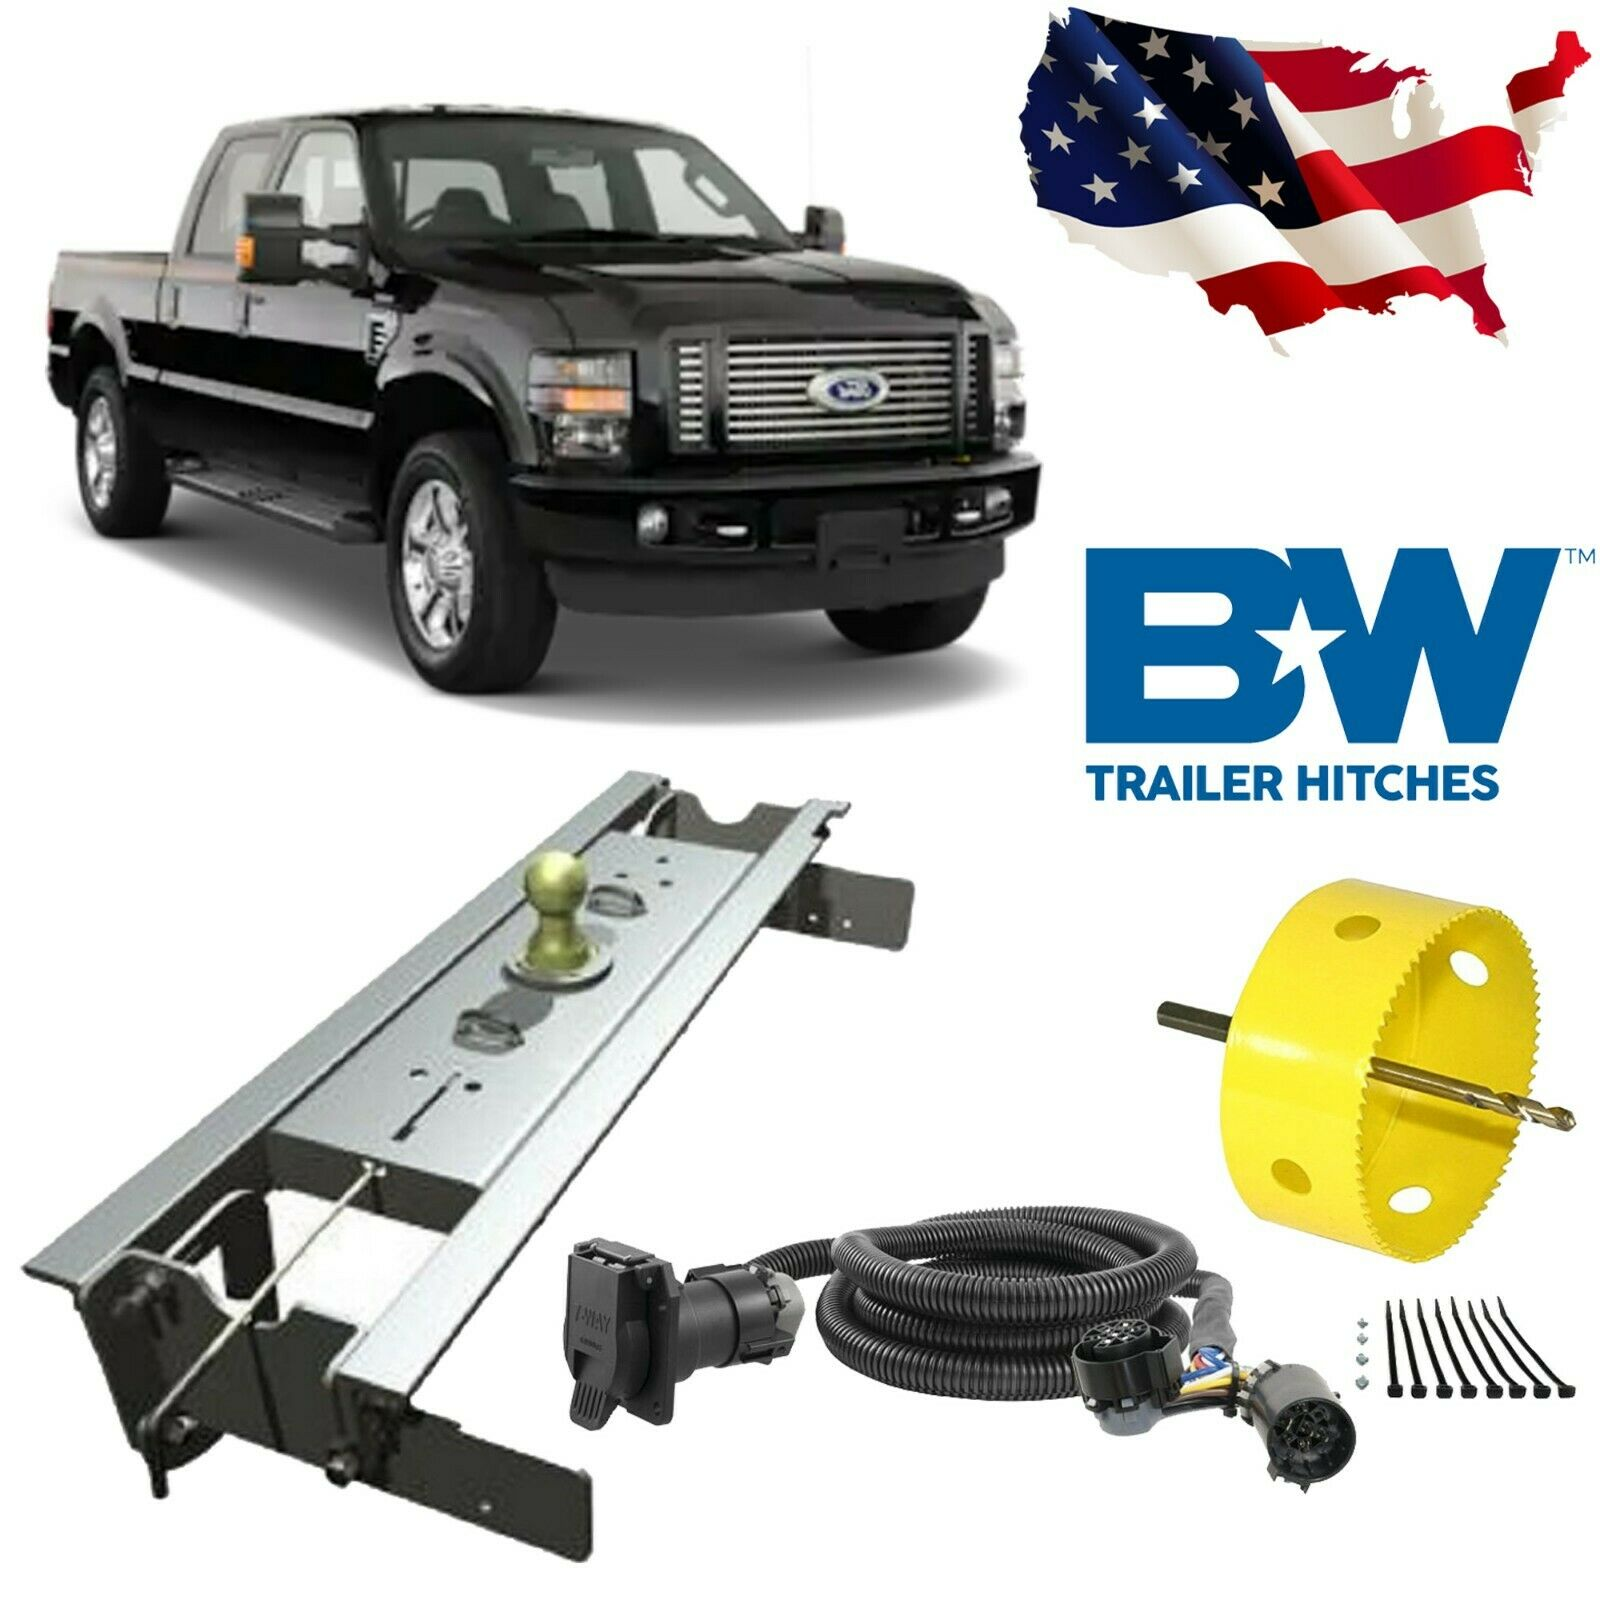 b&w gooseneck hitch w/hole saw & wiring harness for 1999-2010 ford  f-250/f-350   ebay  ebay